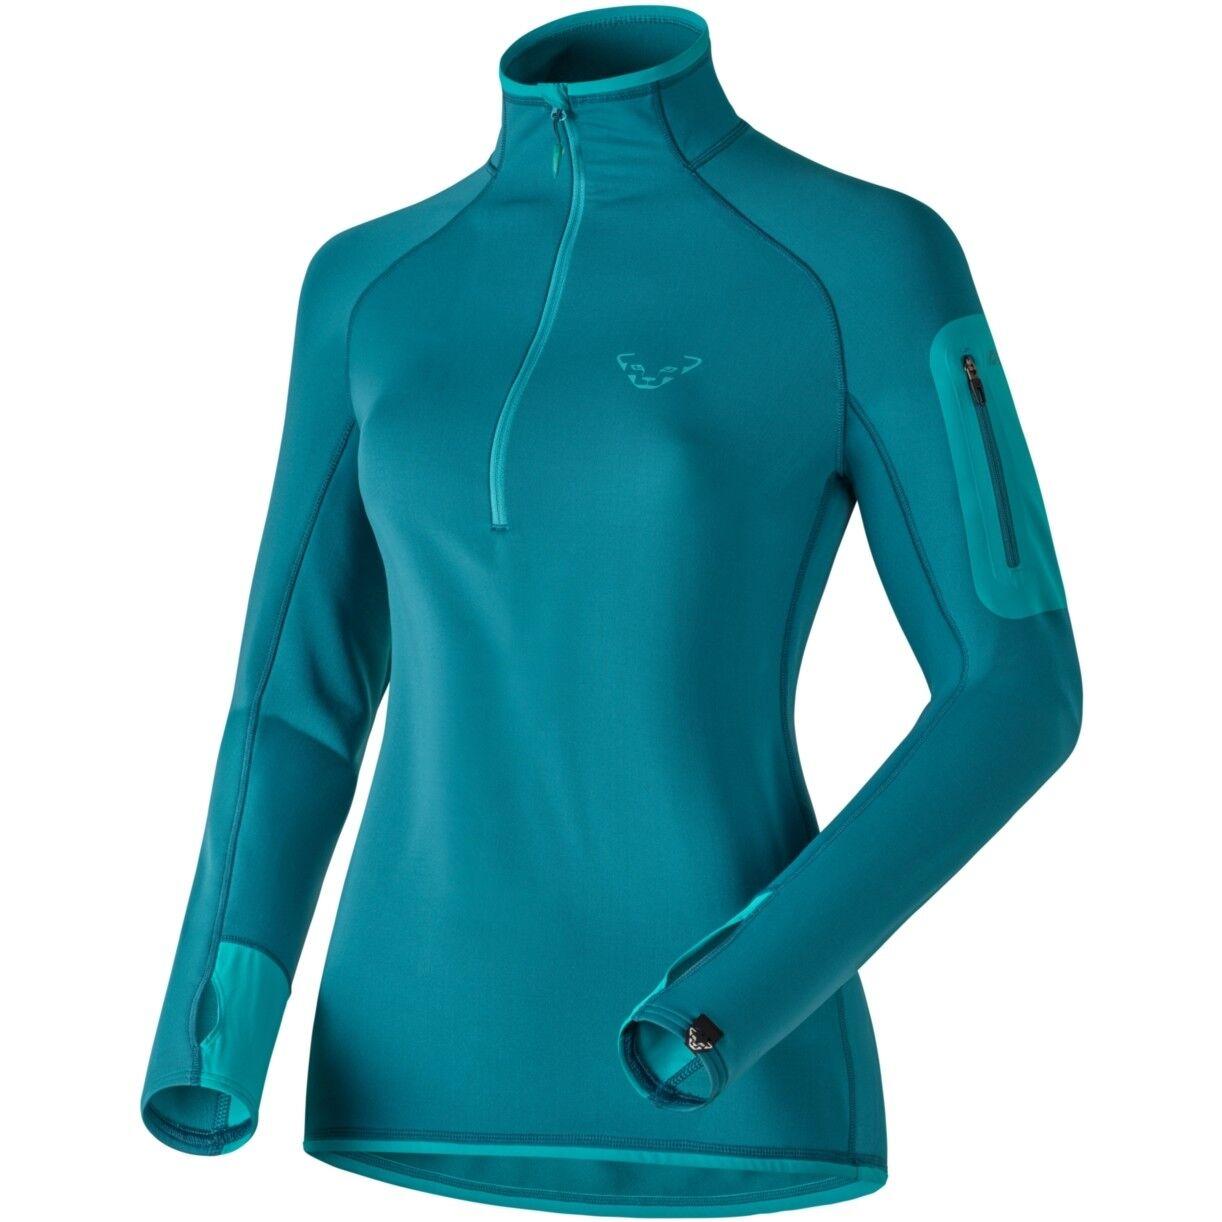 NEW Dynafit THERMAL Womens XL 1 2 Zip Tee Hiking Running Midlayer Shirt Msrp 120